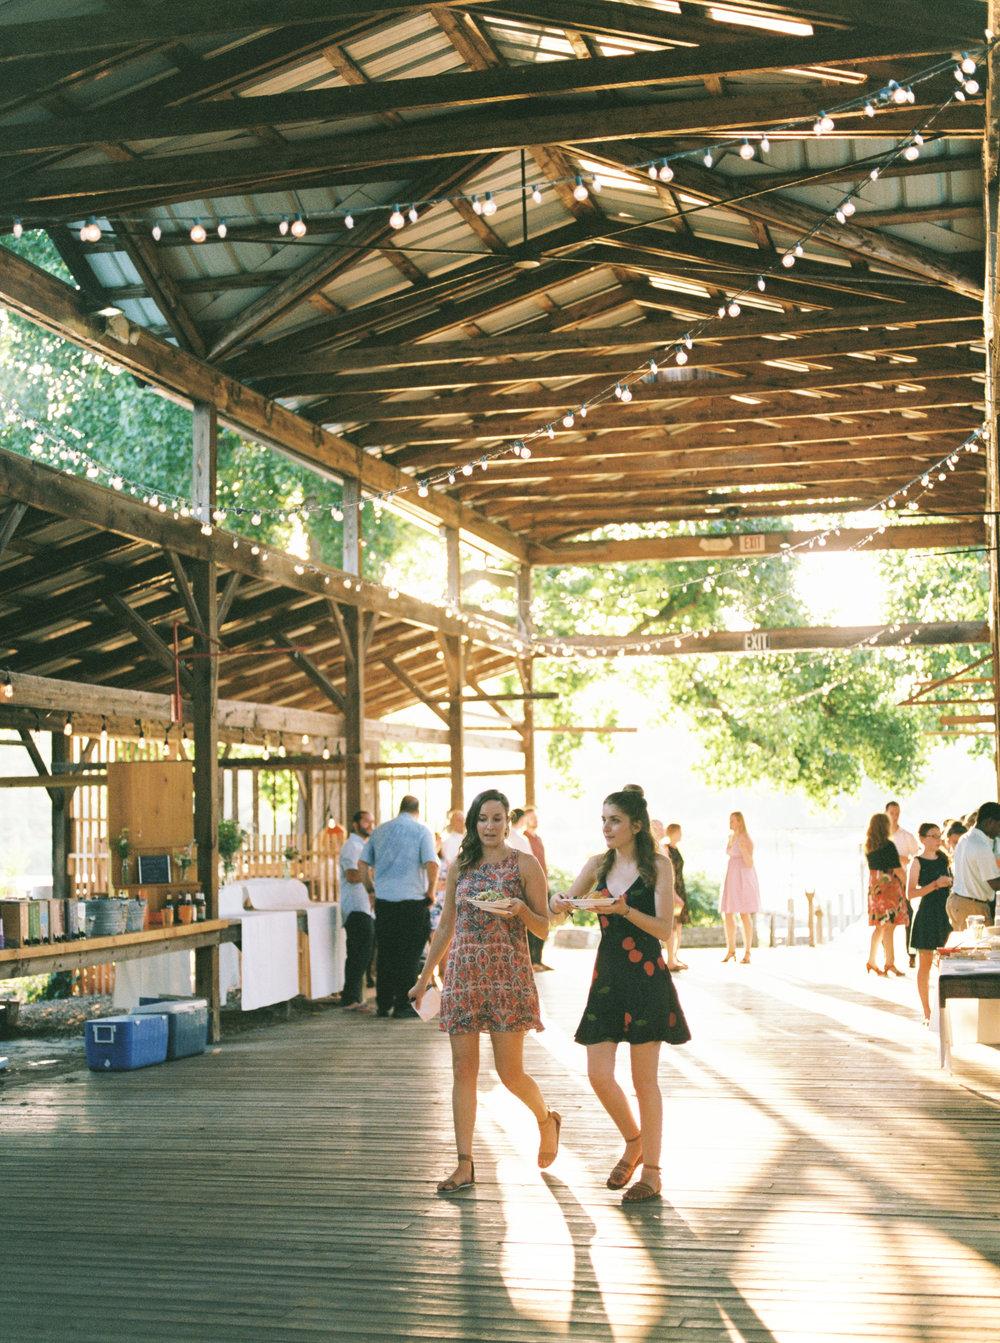 ithaca-farmers-market-wedding-haley-richter-photography-143.jpg